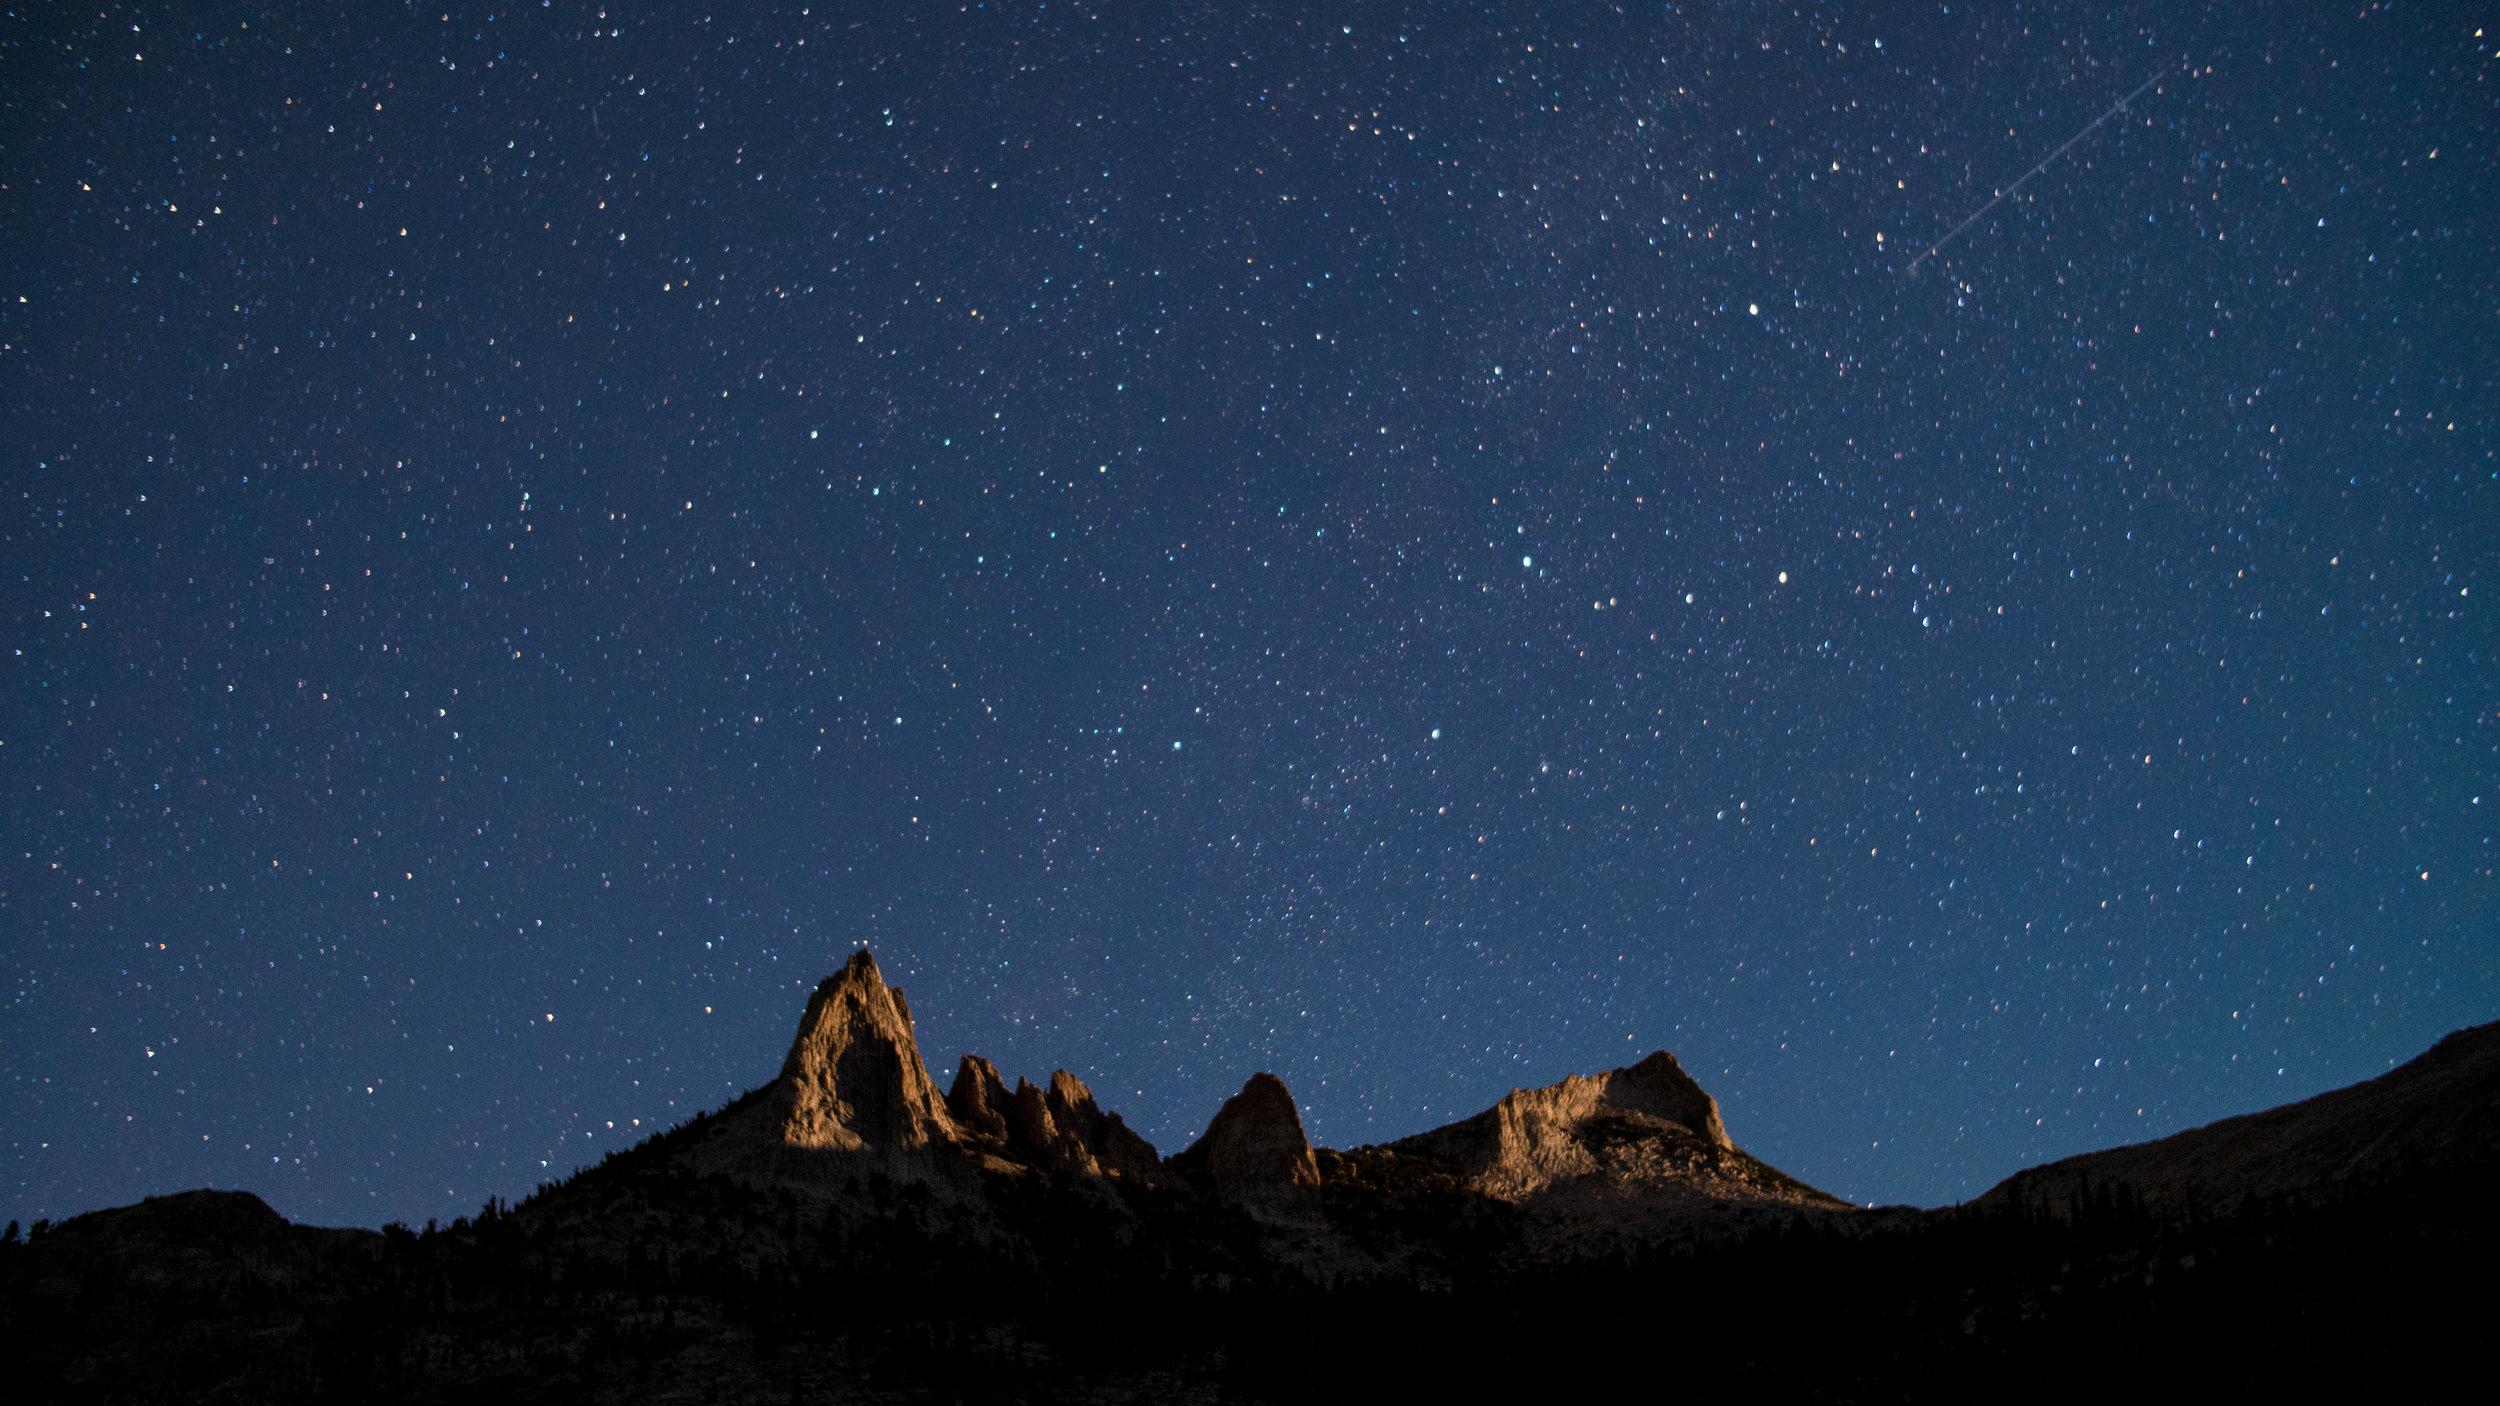 Tuolumne Meadows, Yosemite NP, California